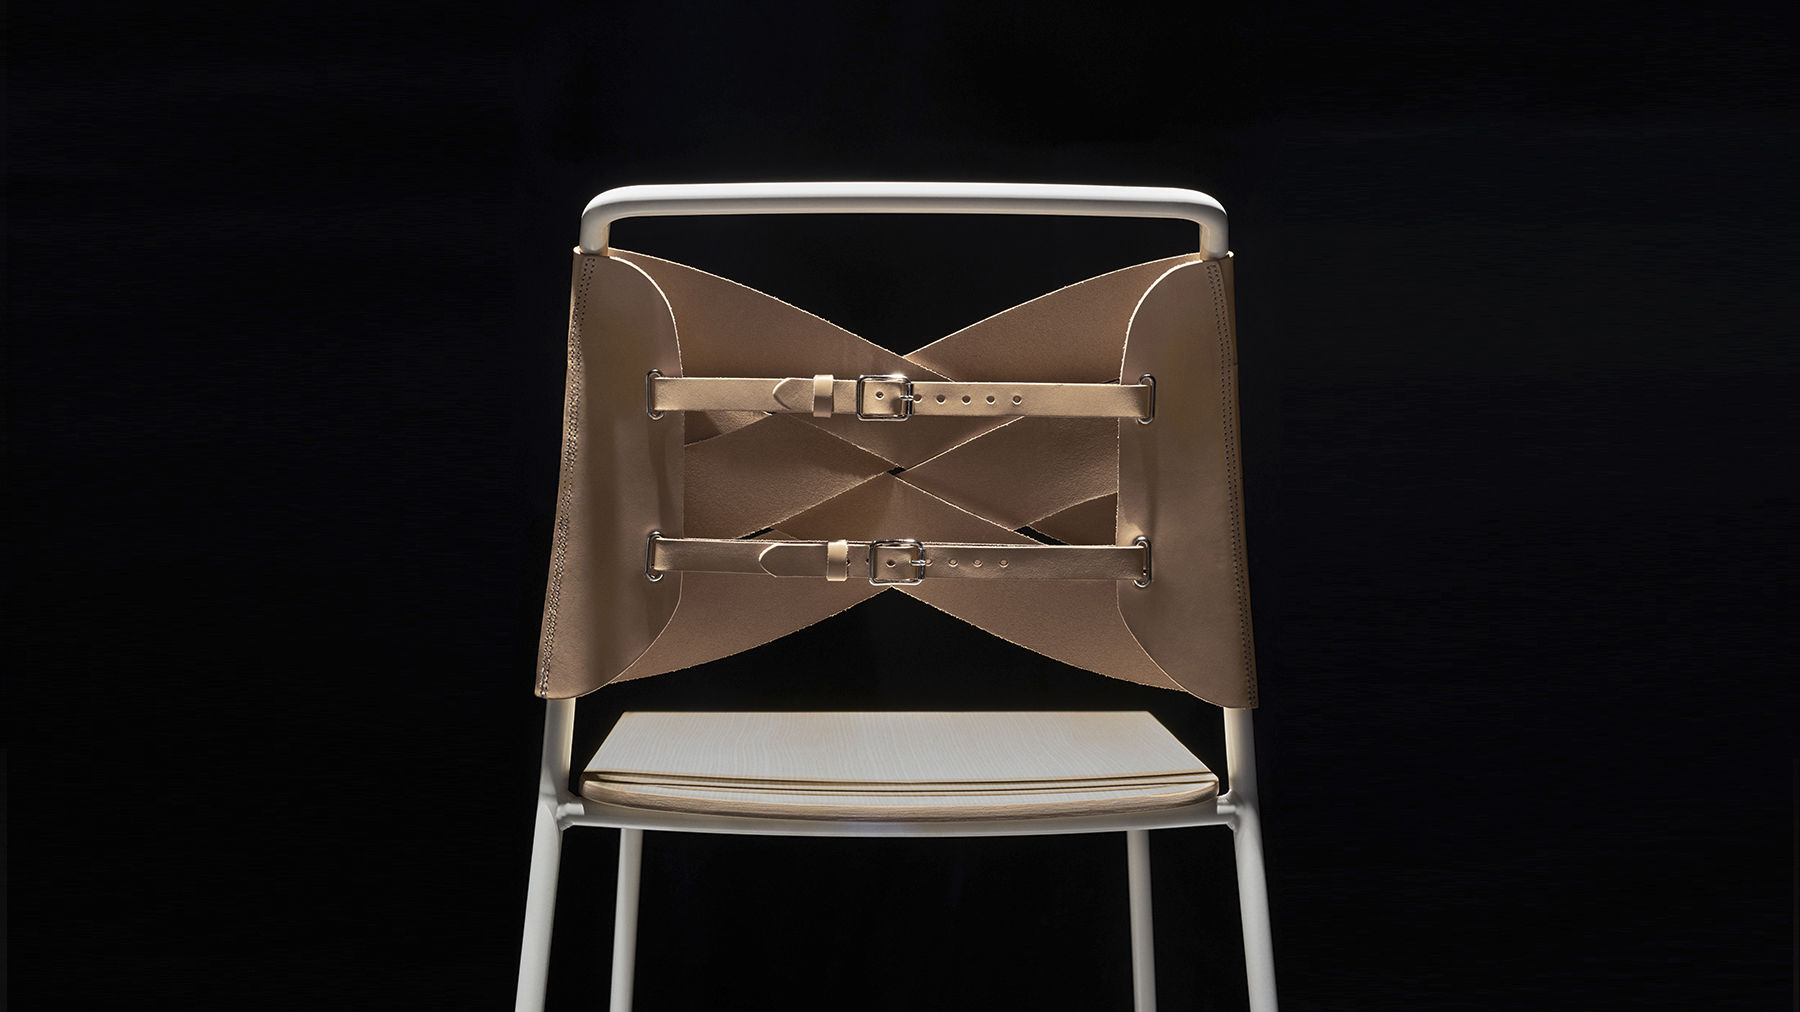 Sedia alta moderna con poggiapiedi impilabile in pelle